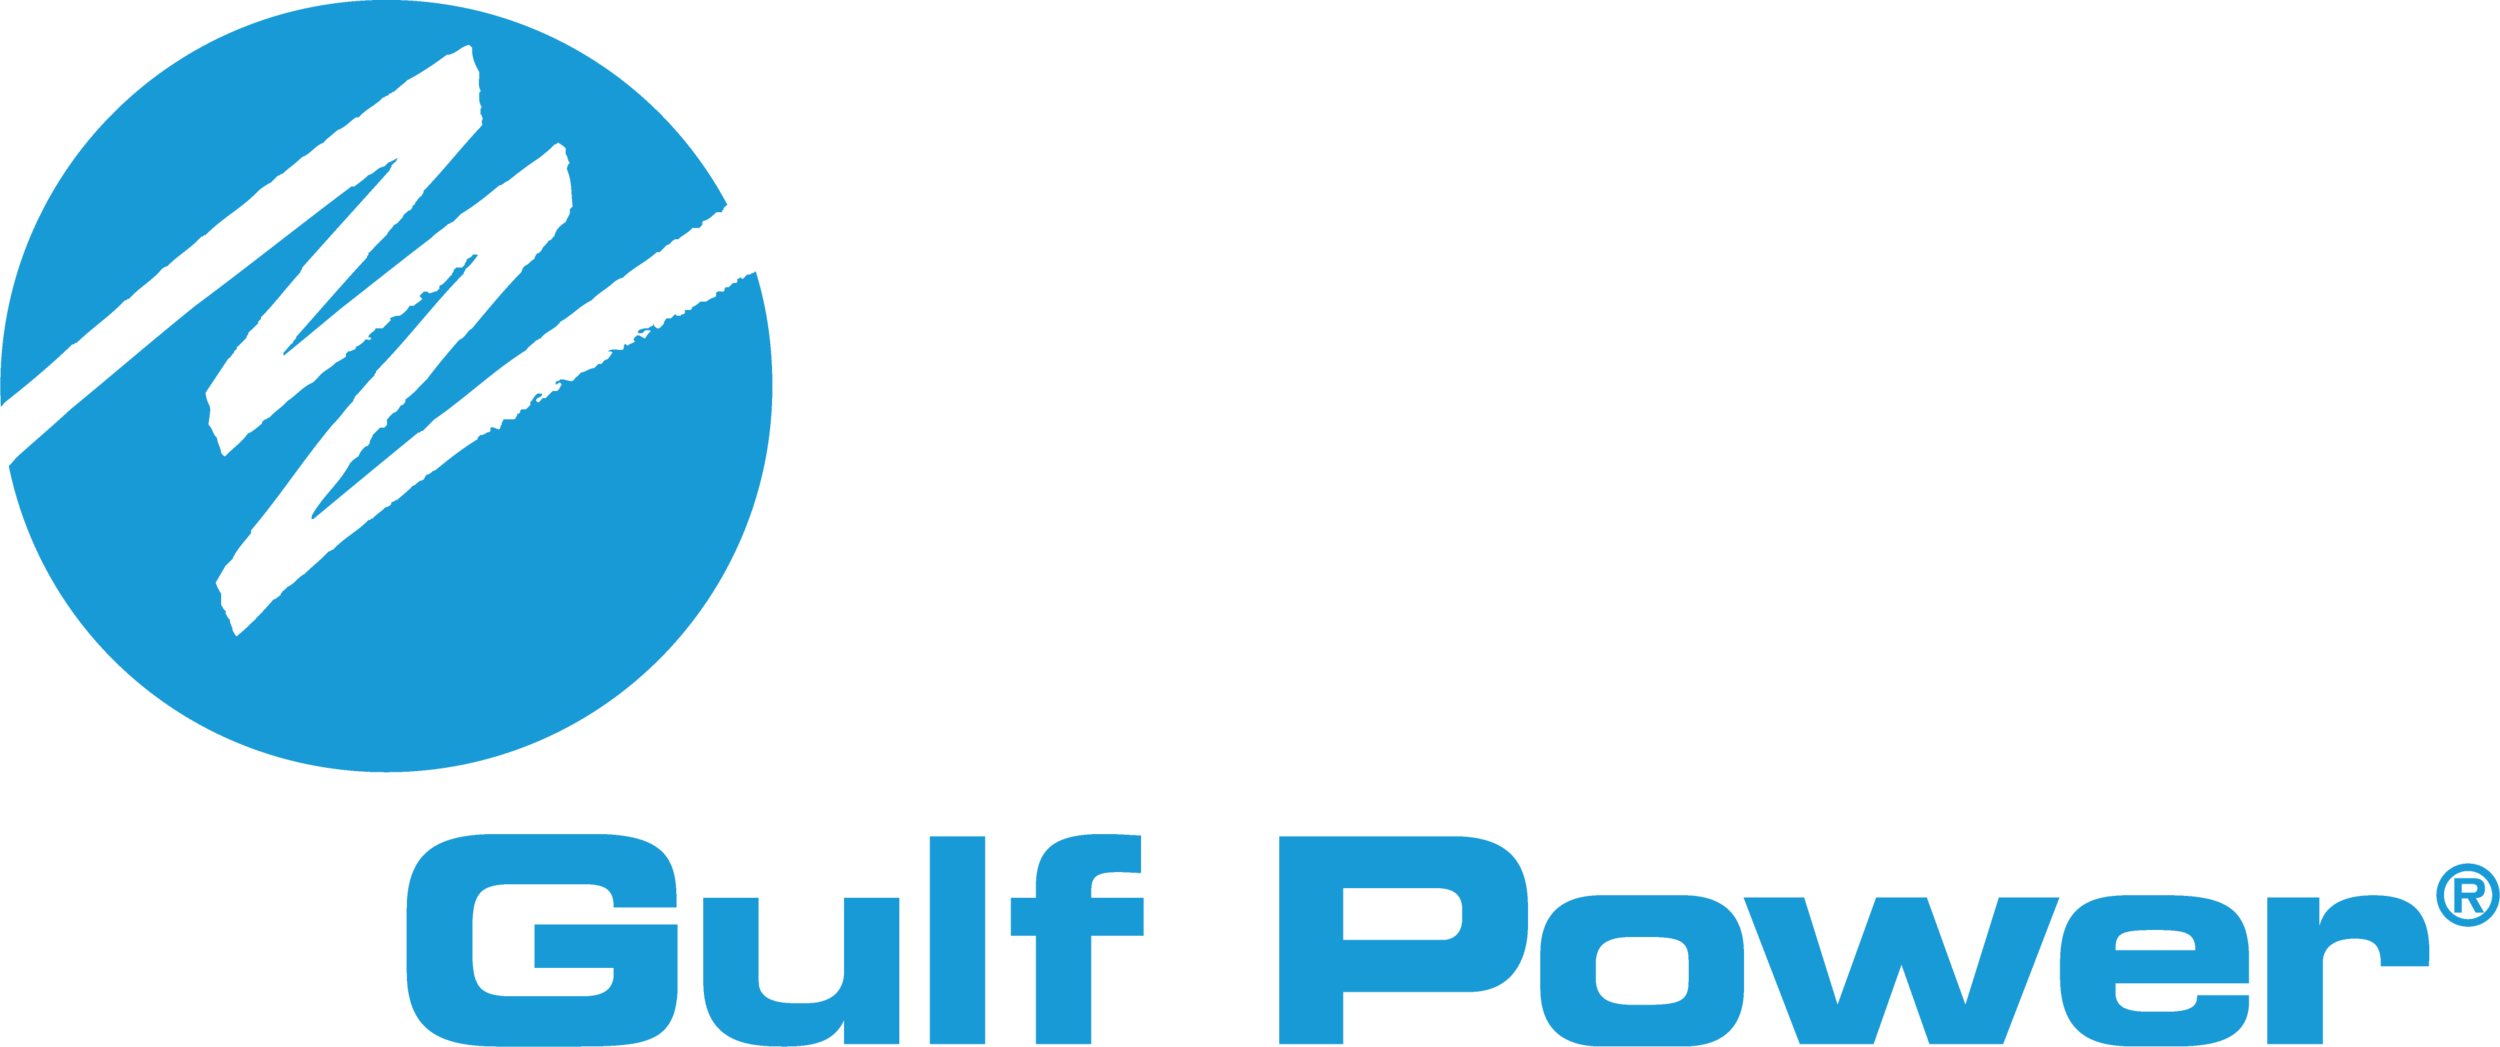 Gulf Power Logo